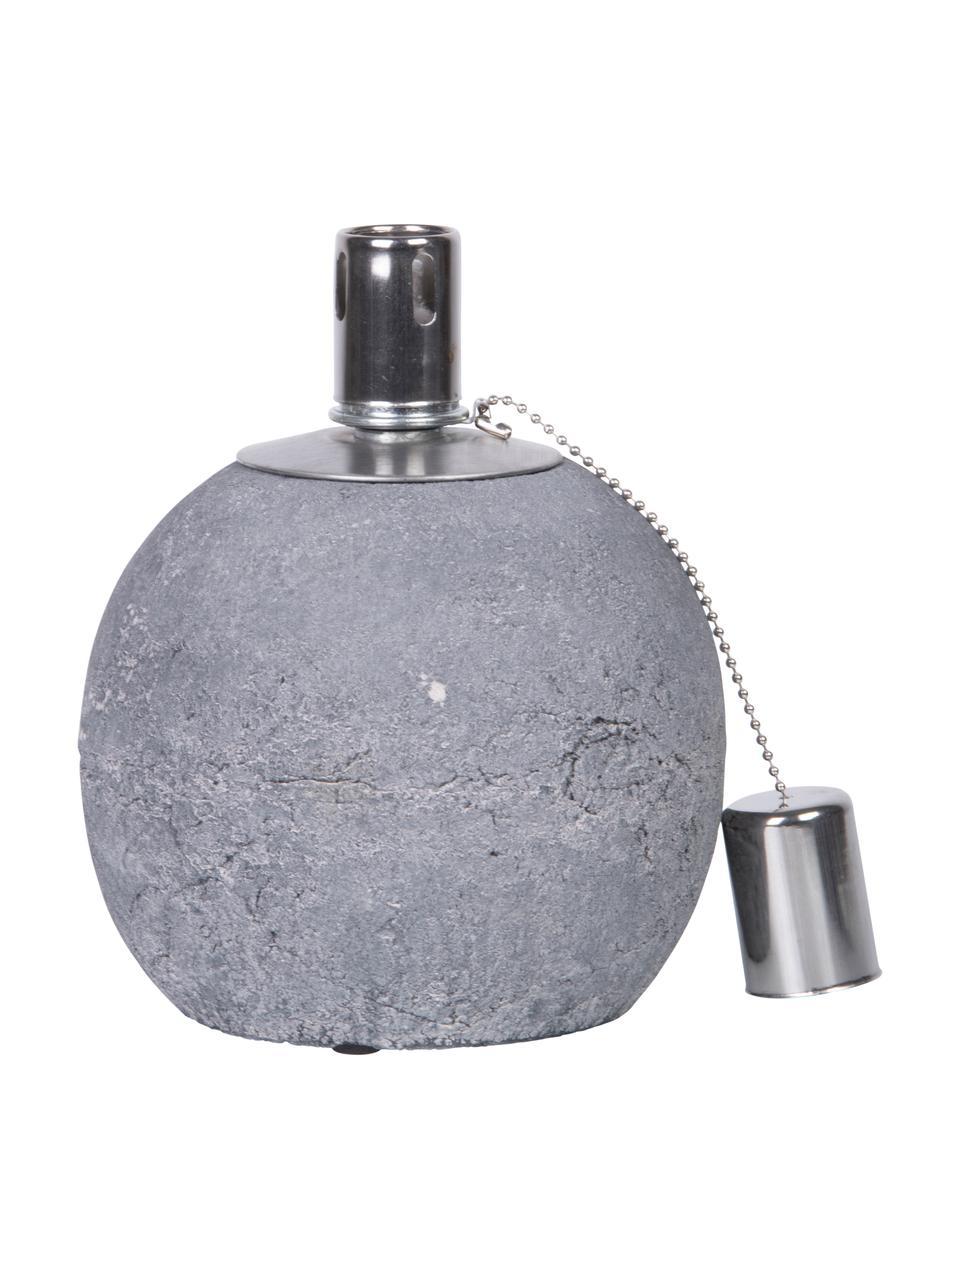 Lampada a olio Raw, Cemento, acciaio inossidabile, Grigio, Ø 14 x Alt. 17 cm